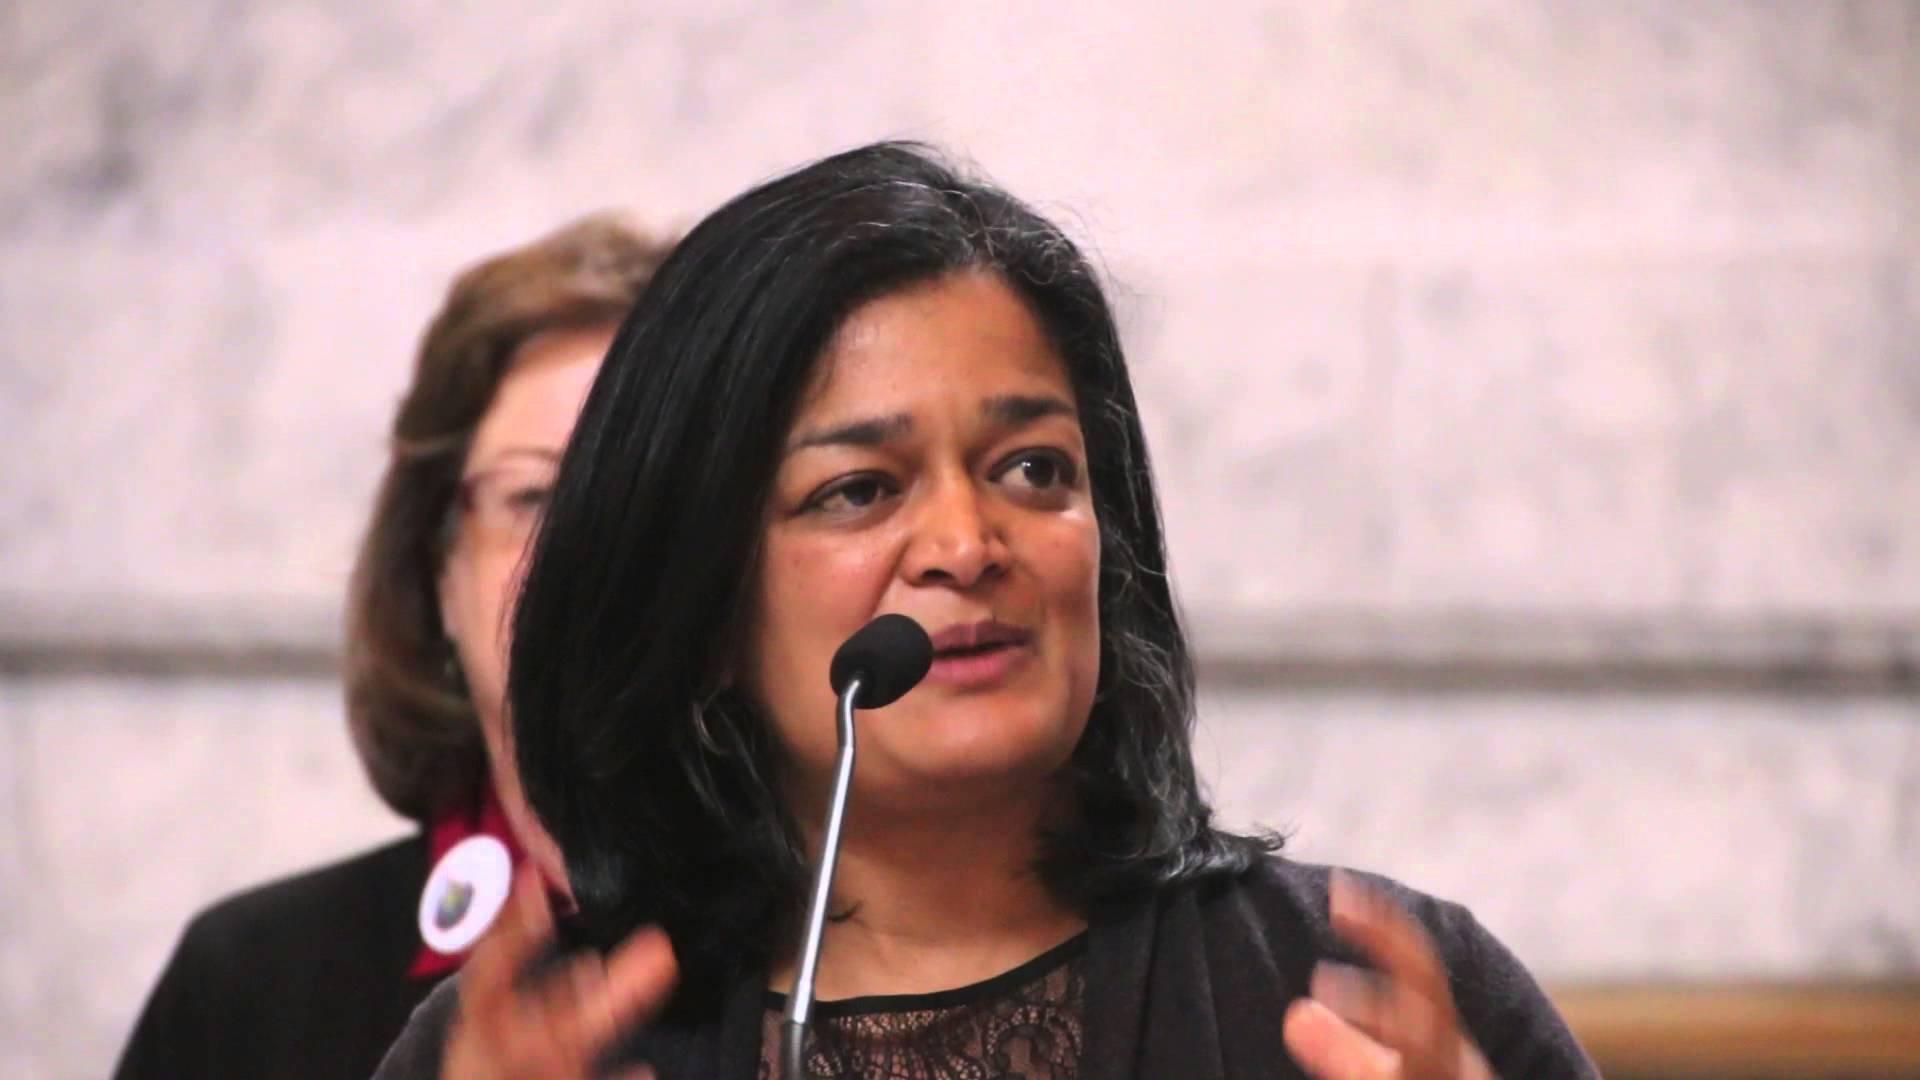 Seattle Rep. Pramila Jayapal introduces first House Bill